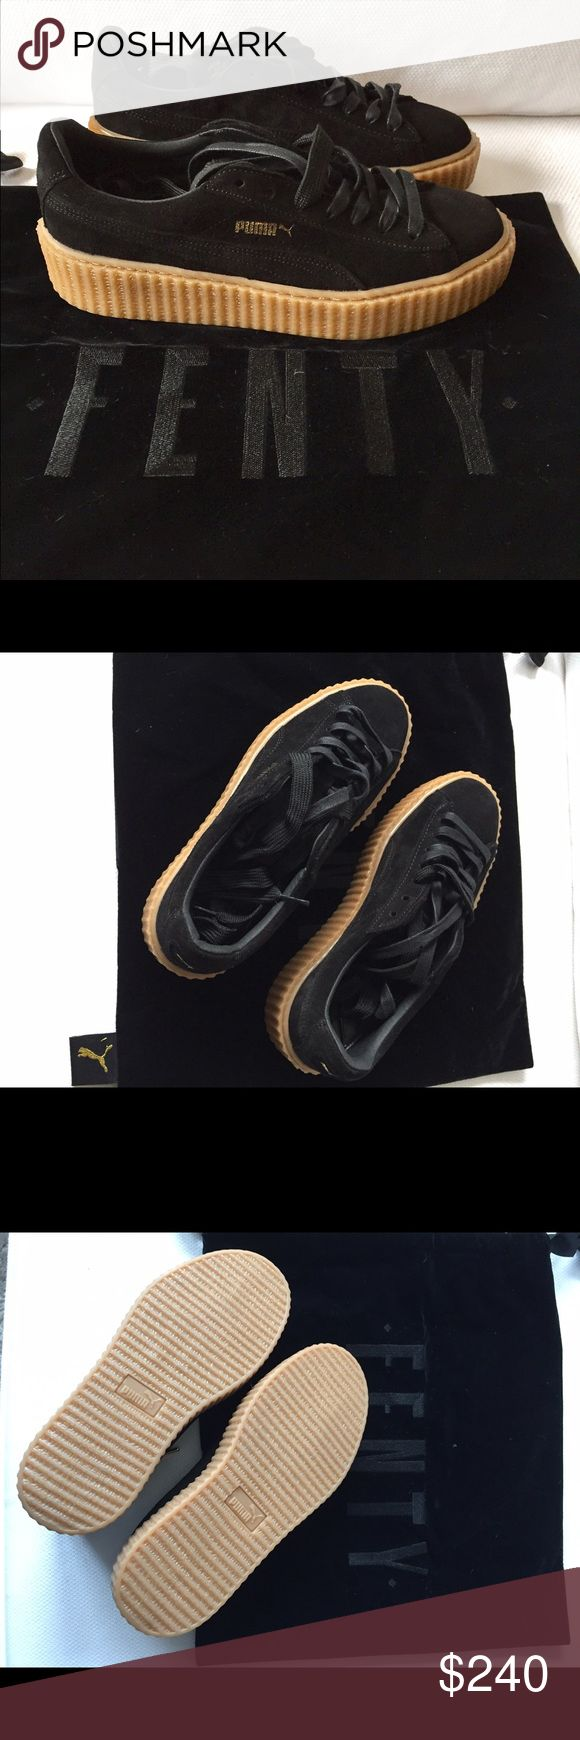 Rhianna Puma Fenty Creeper Sneaker Black/Gum Rhianna Puma Fenty Creeper Sneaker, brand new never been worn. Comes with Fenty black velvet duster bag. No box. Puma Shoes Sneakers